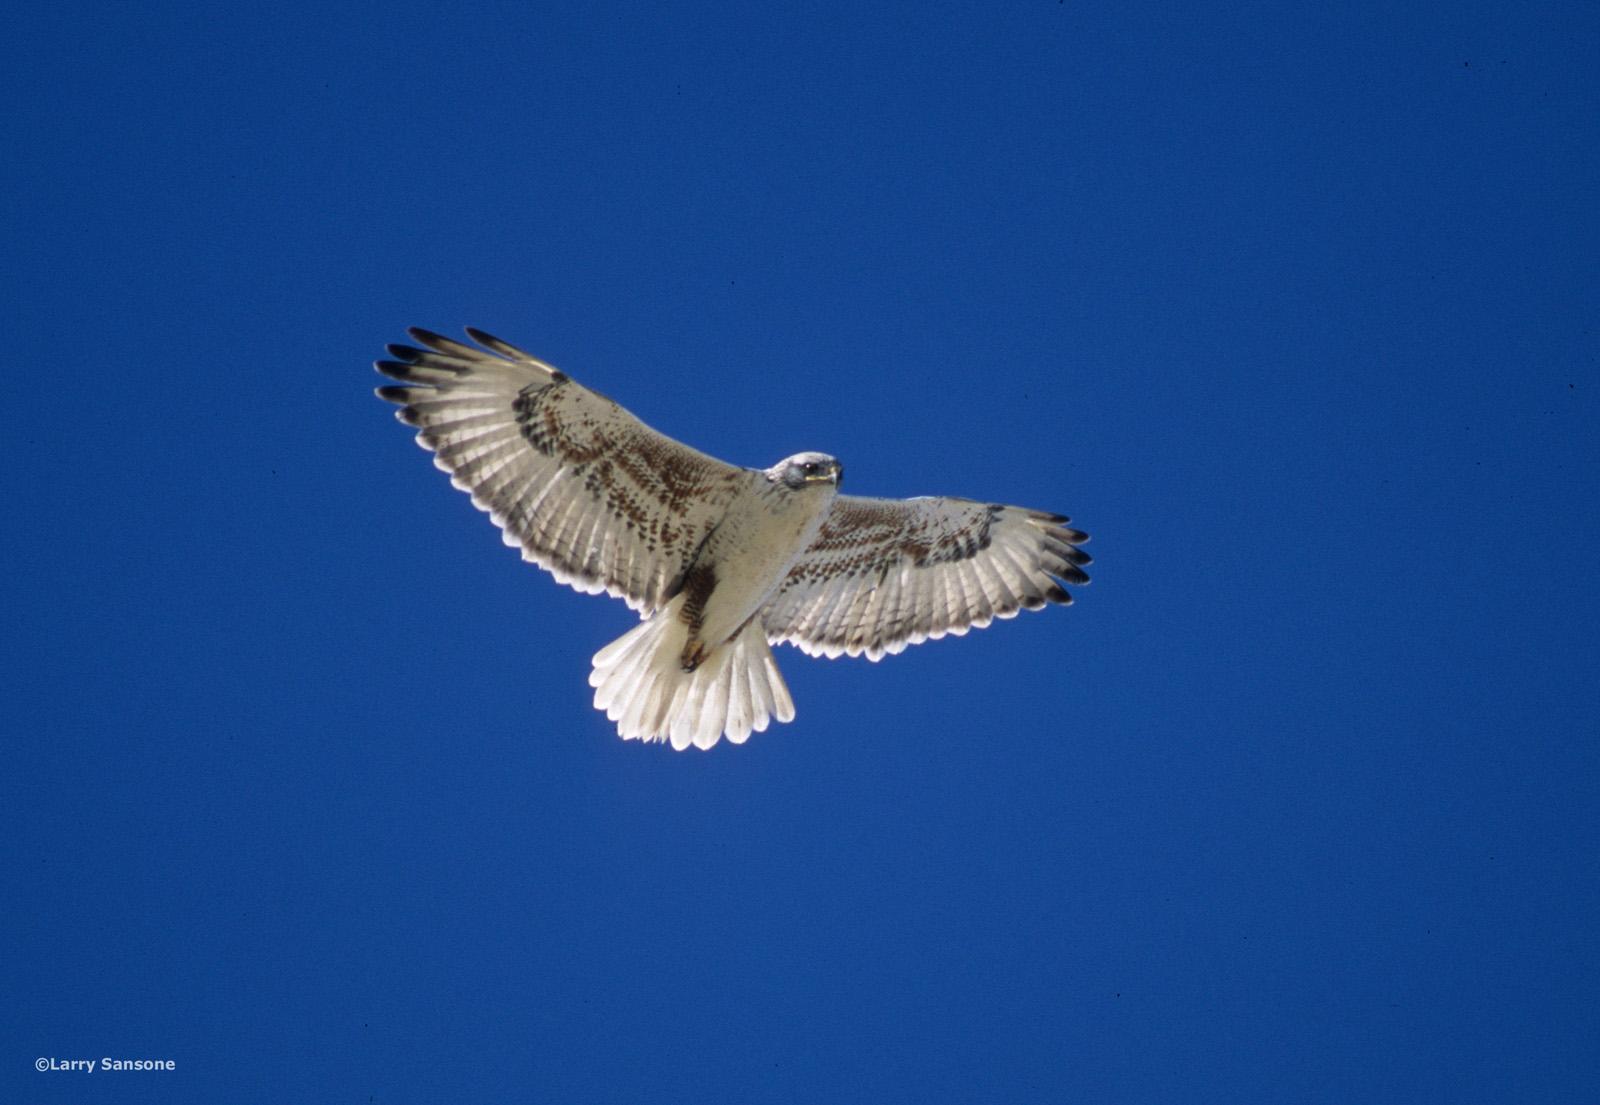 Ferruginous Hawk   Photo by Larry Sansone